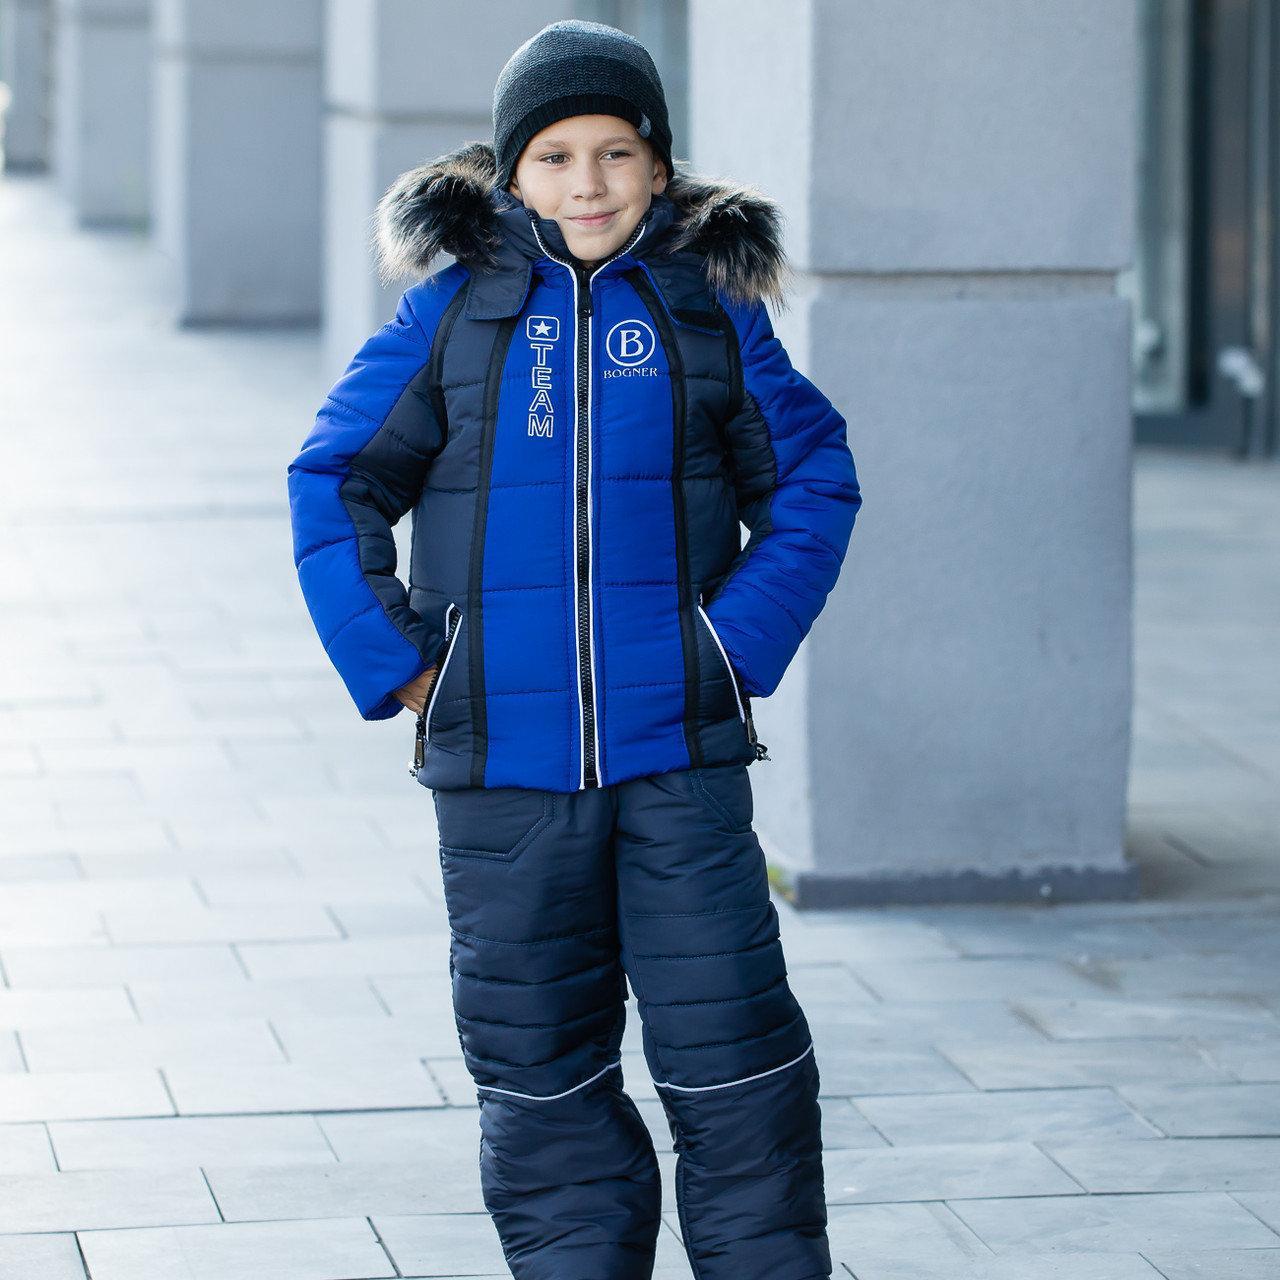 "Зимний комплект (куртка+полукомбинезон) на мальчика ""Богнер"" элекрик 2-7 лет"